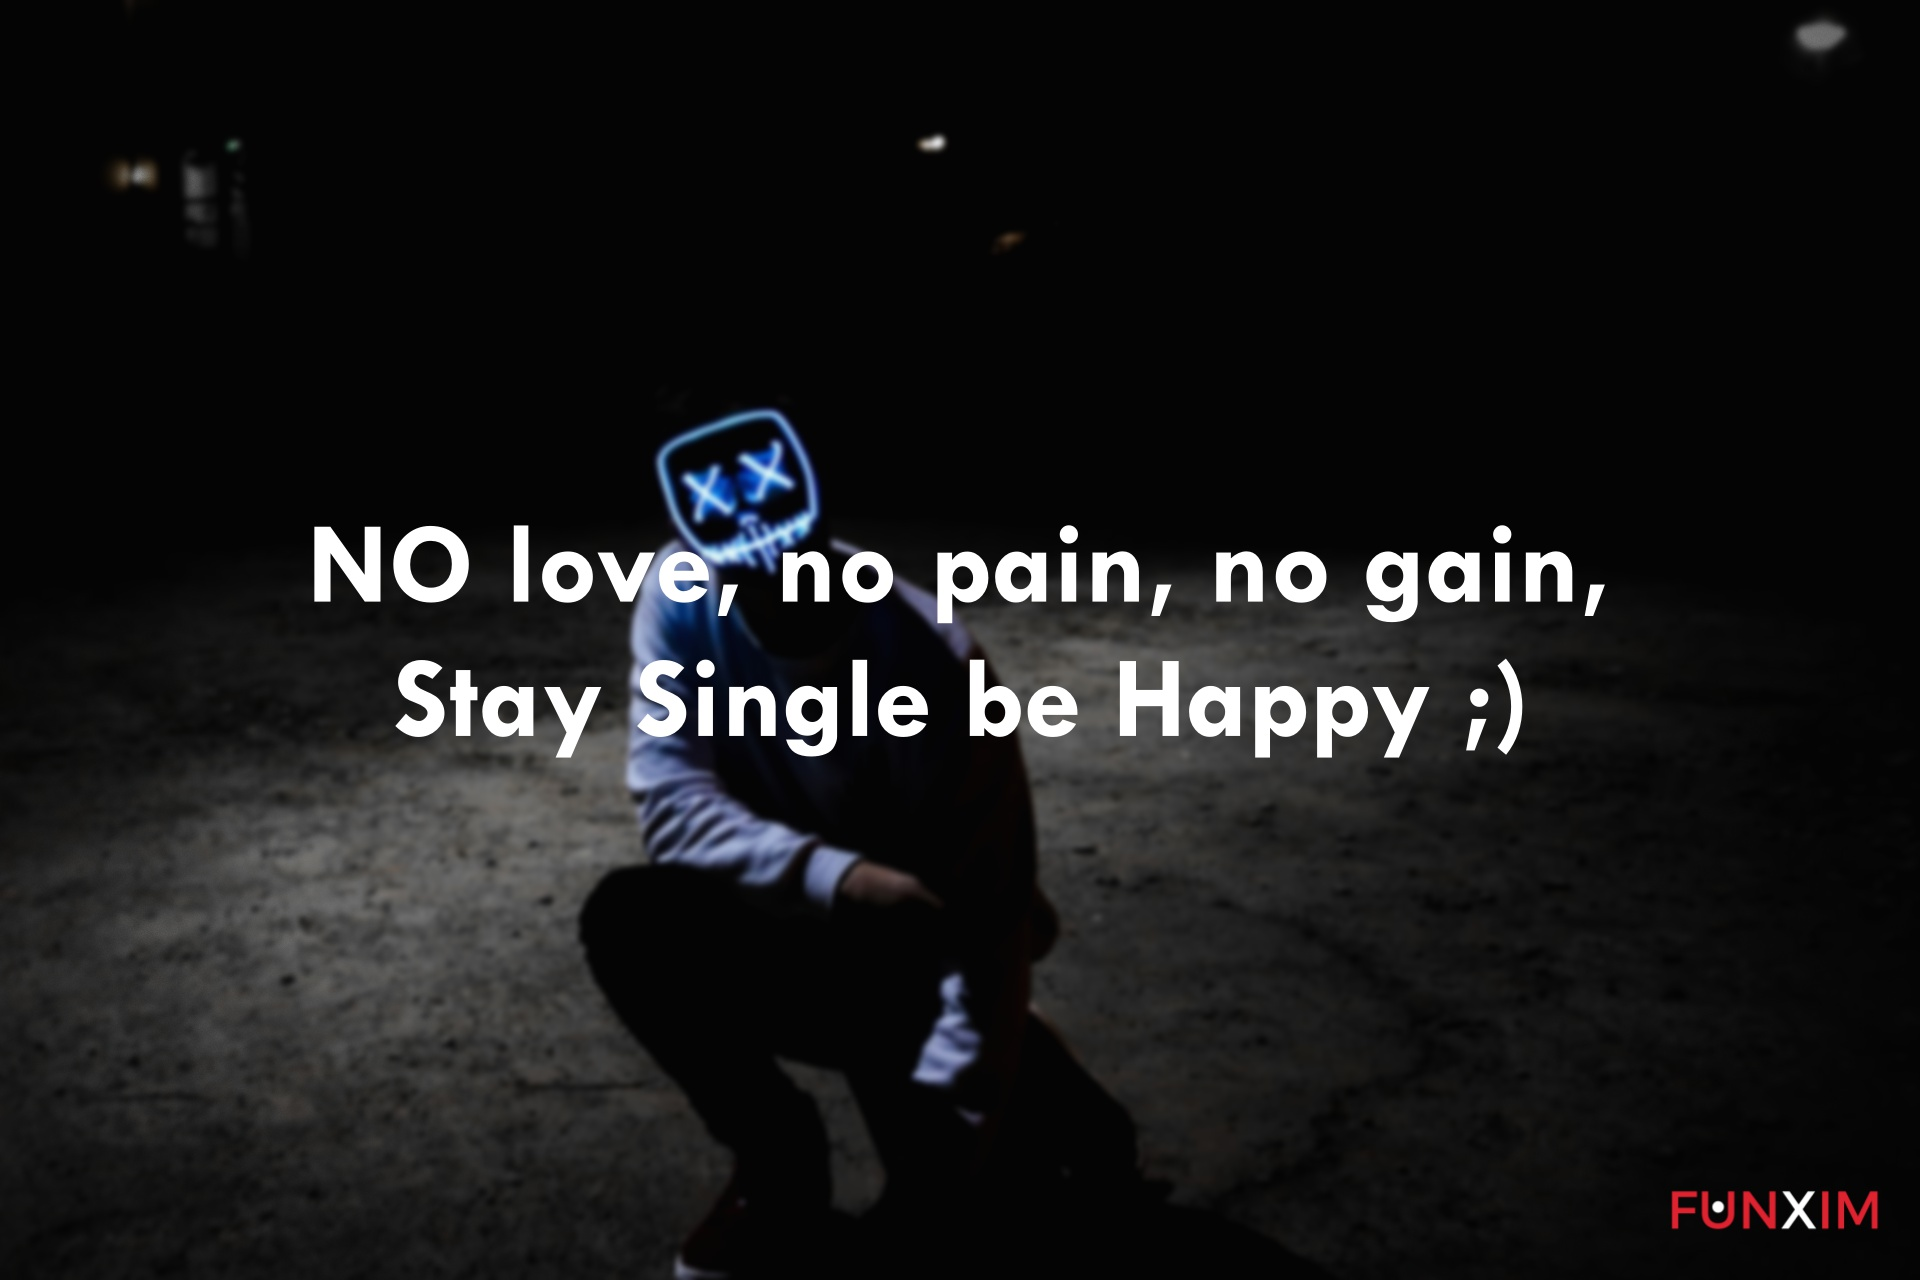 NO love, no pain, no gain, stay Single be Happy